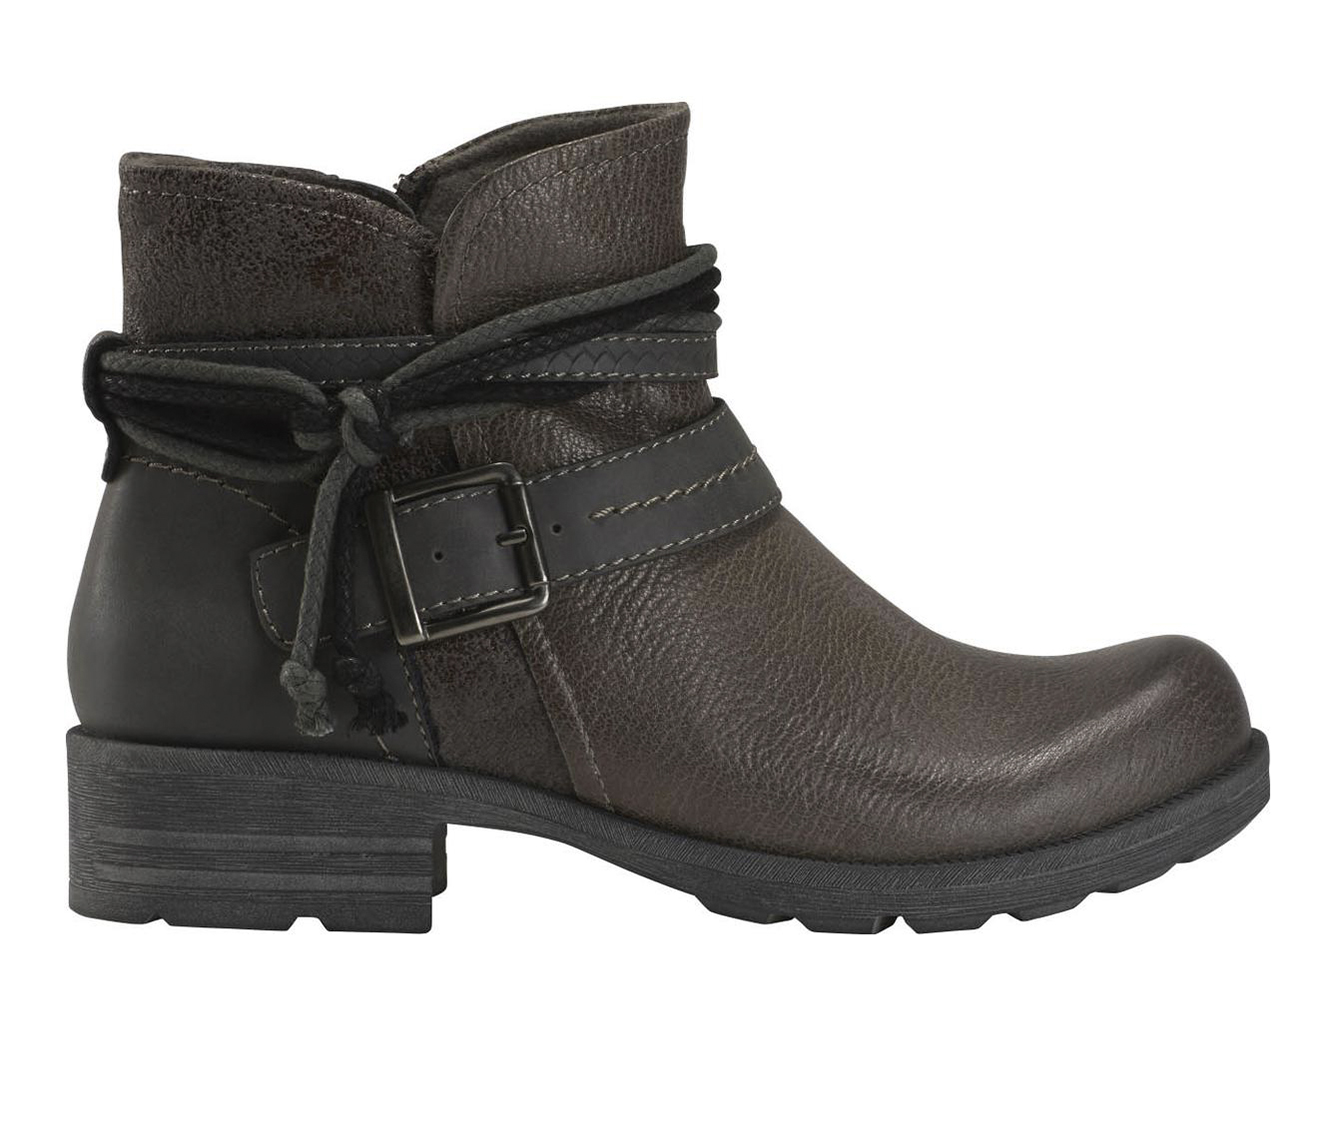 Earth Origins Randi Radley Women's Boots (Gray - Leather)